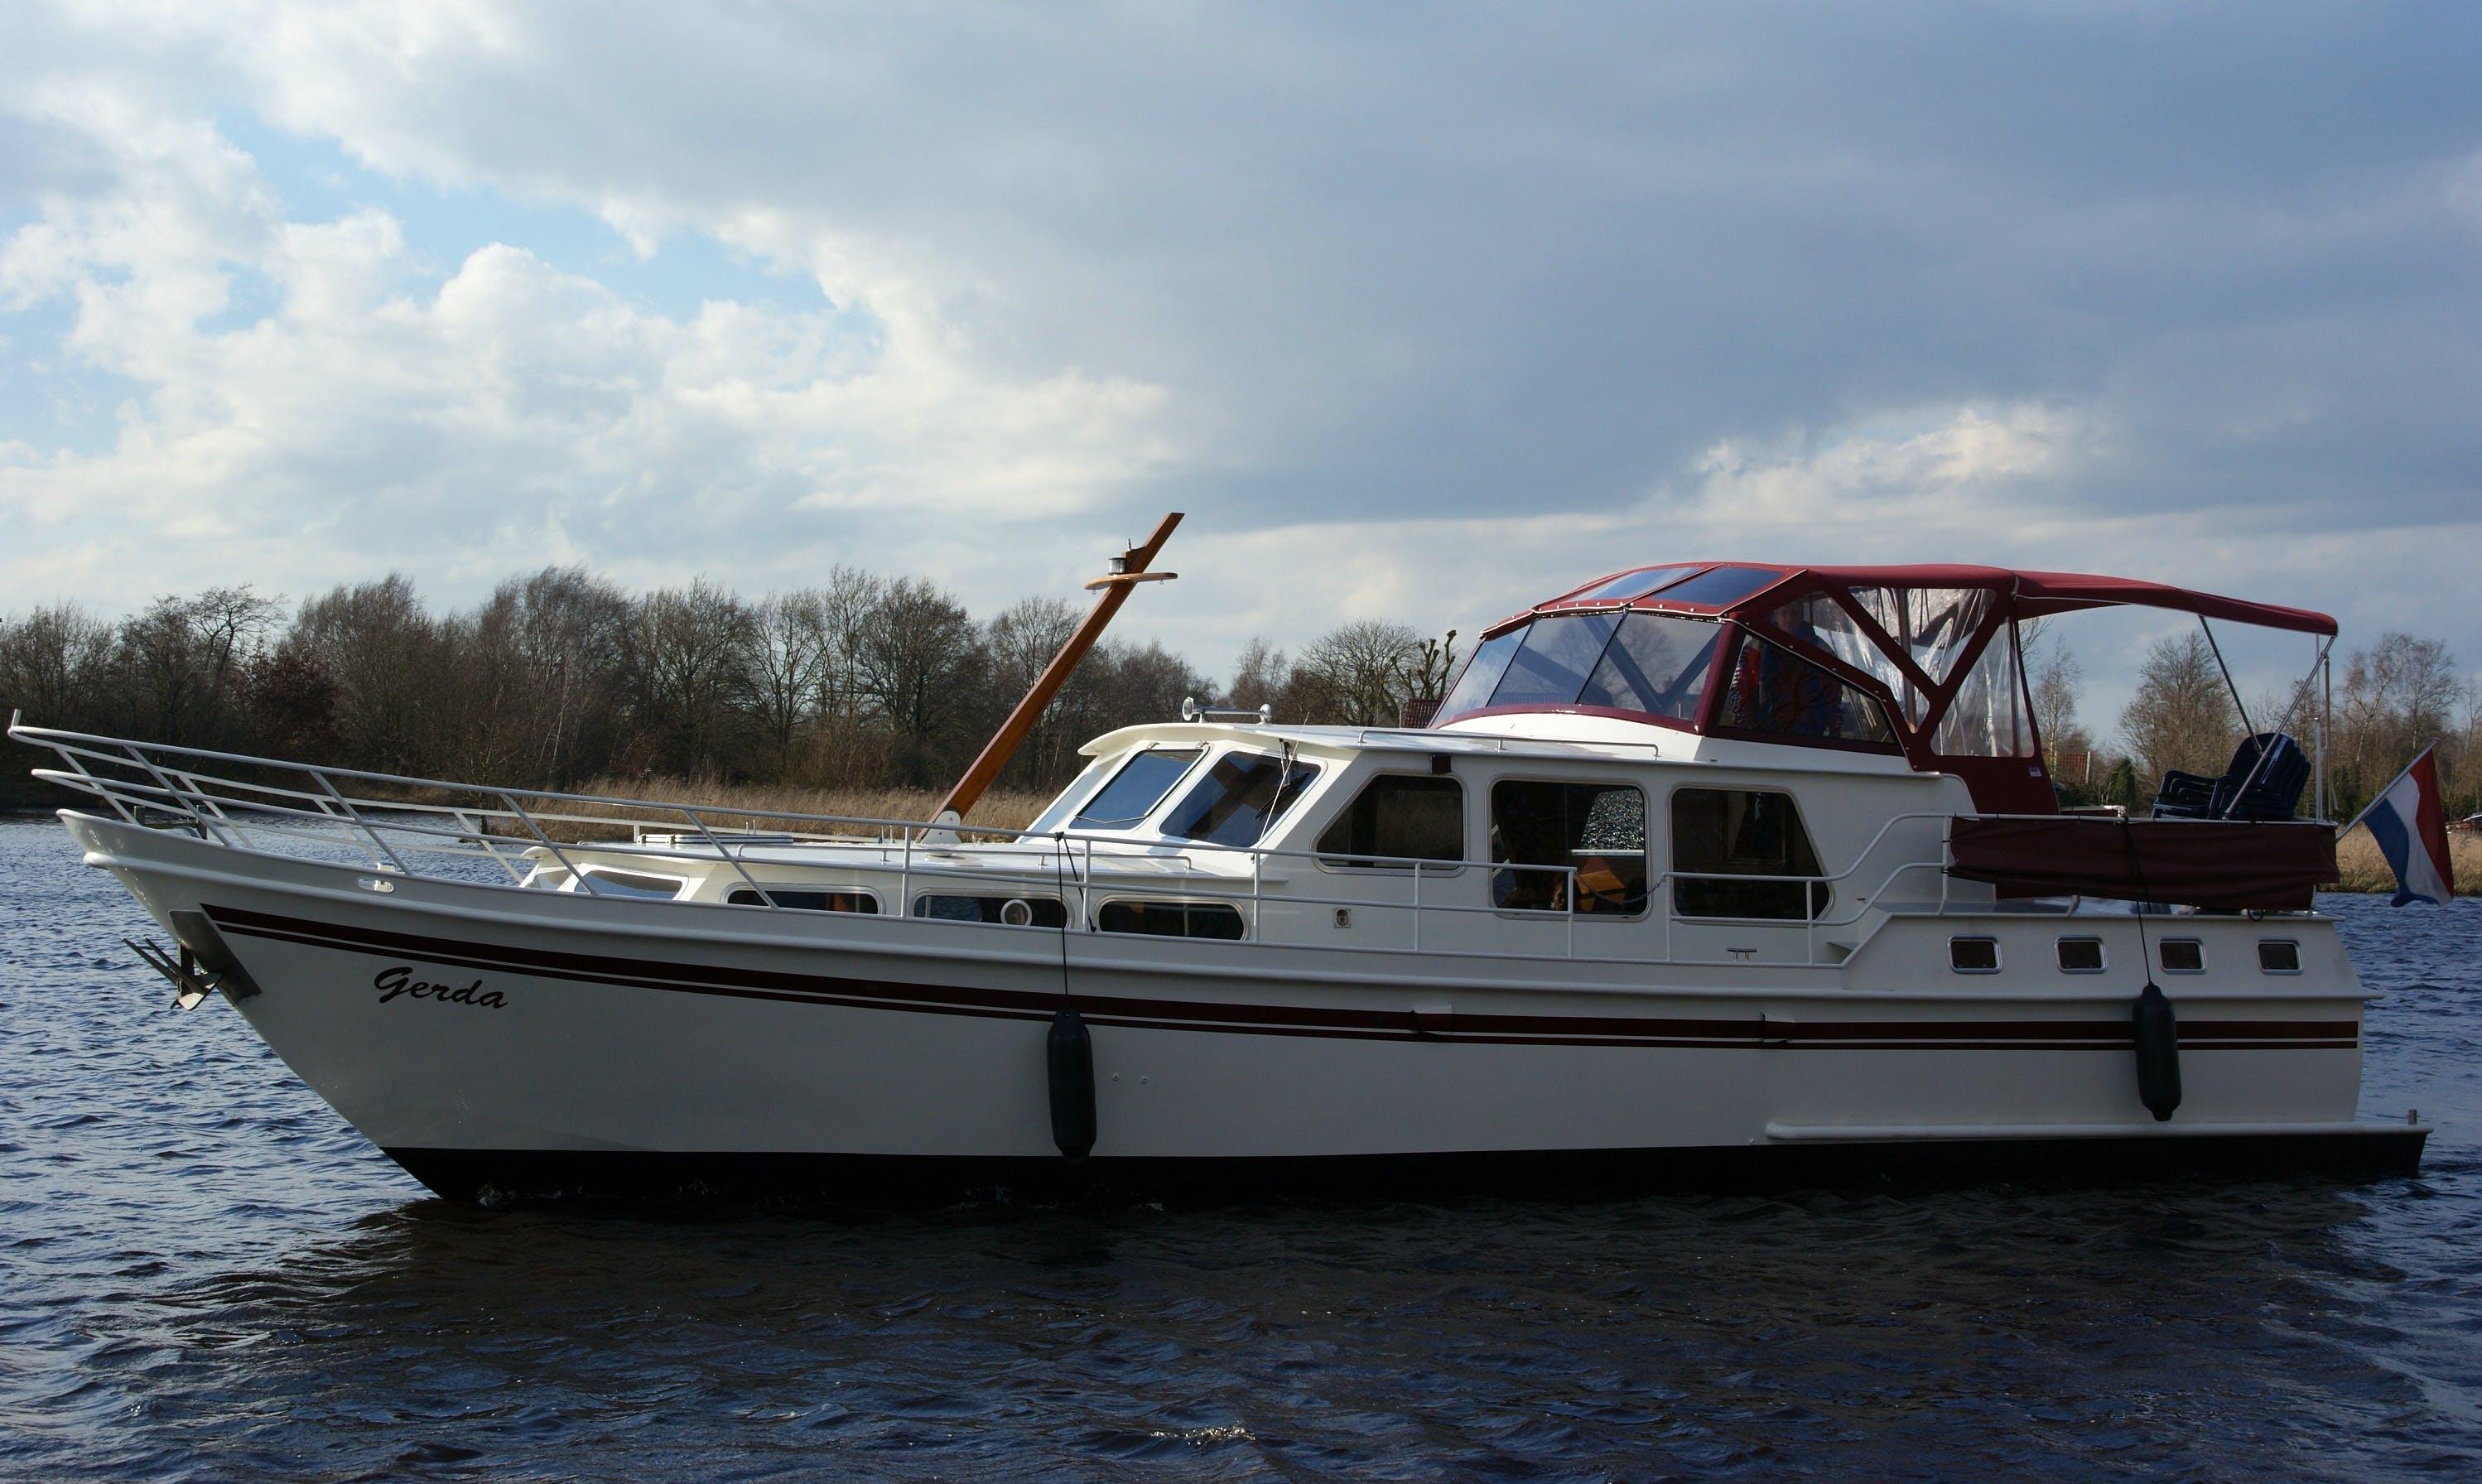 Explore Friesland, Netherlands on 49' Gerda Motor Yacht